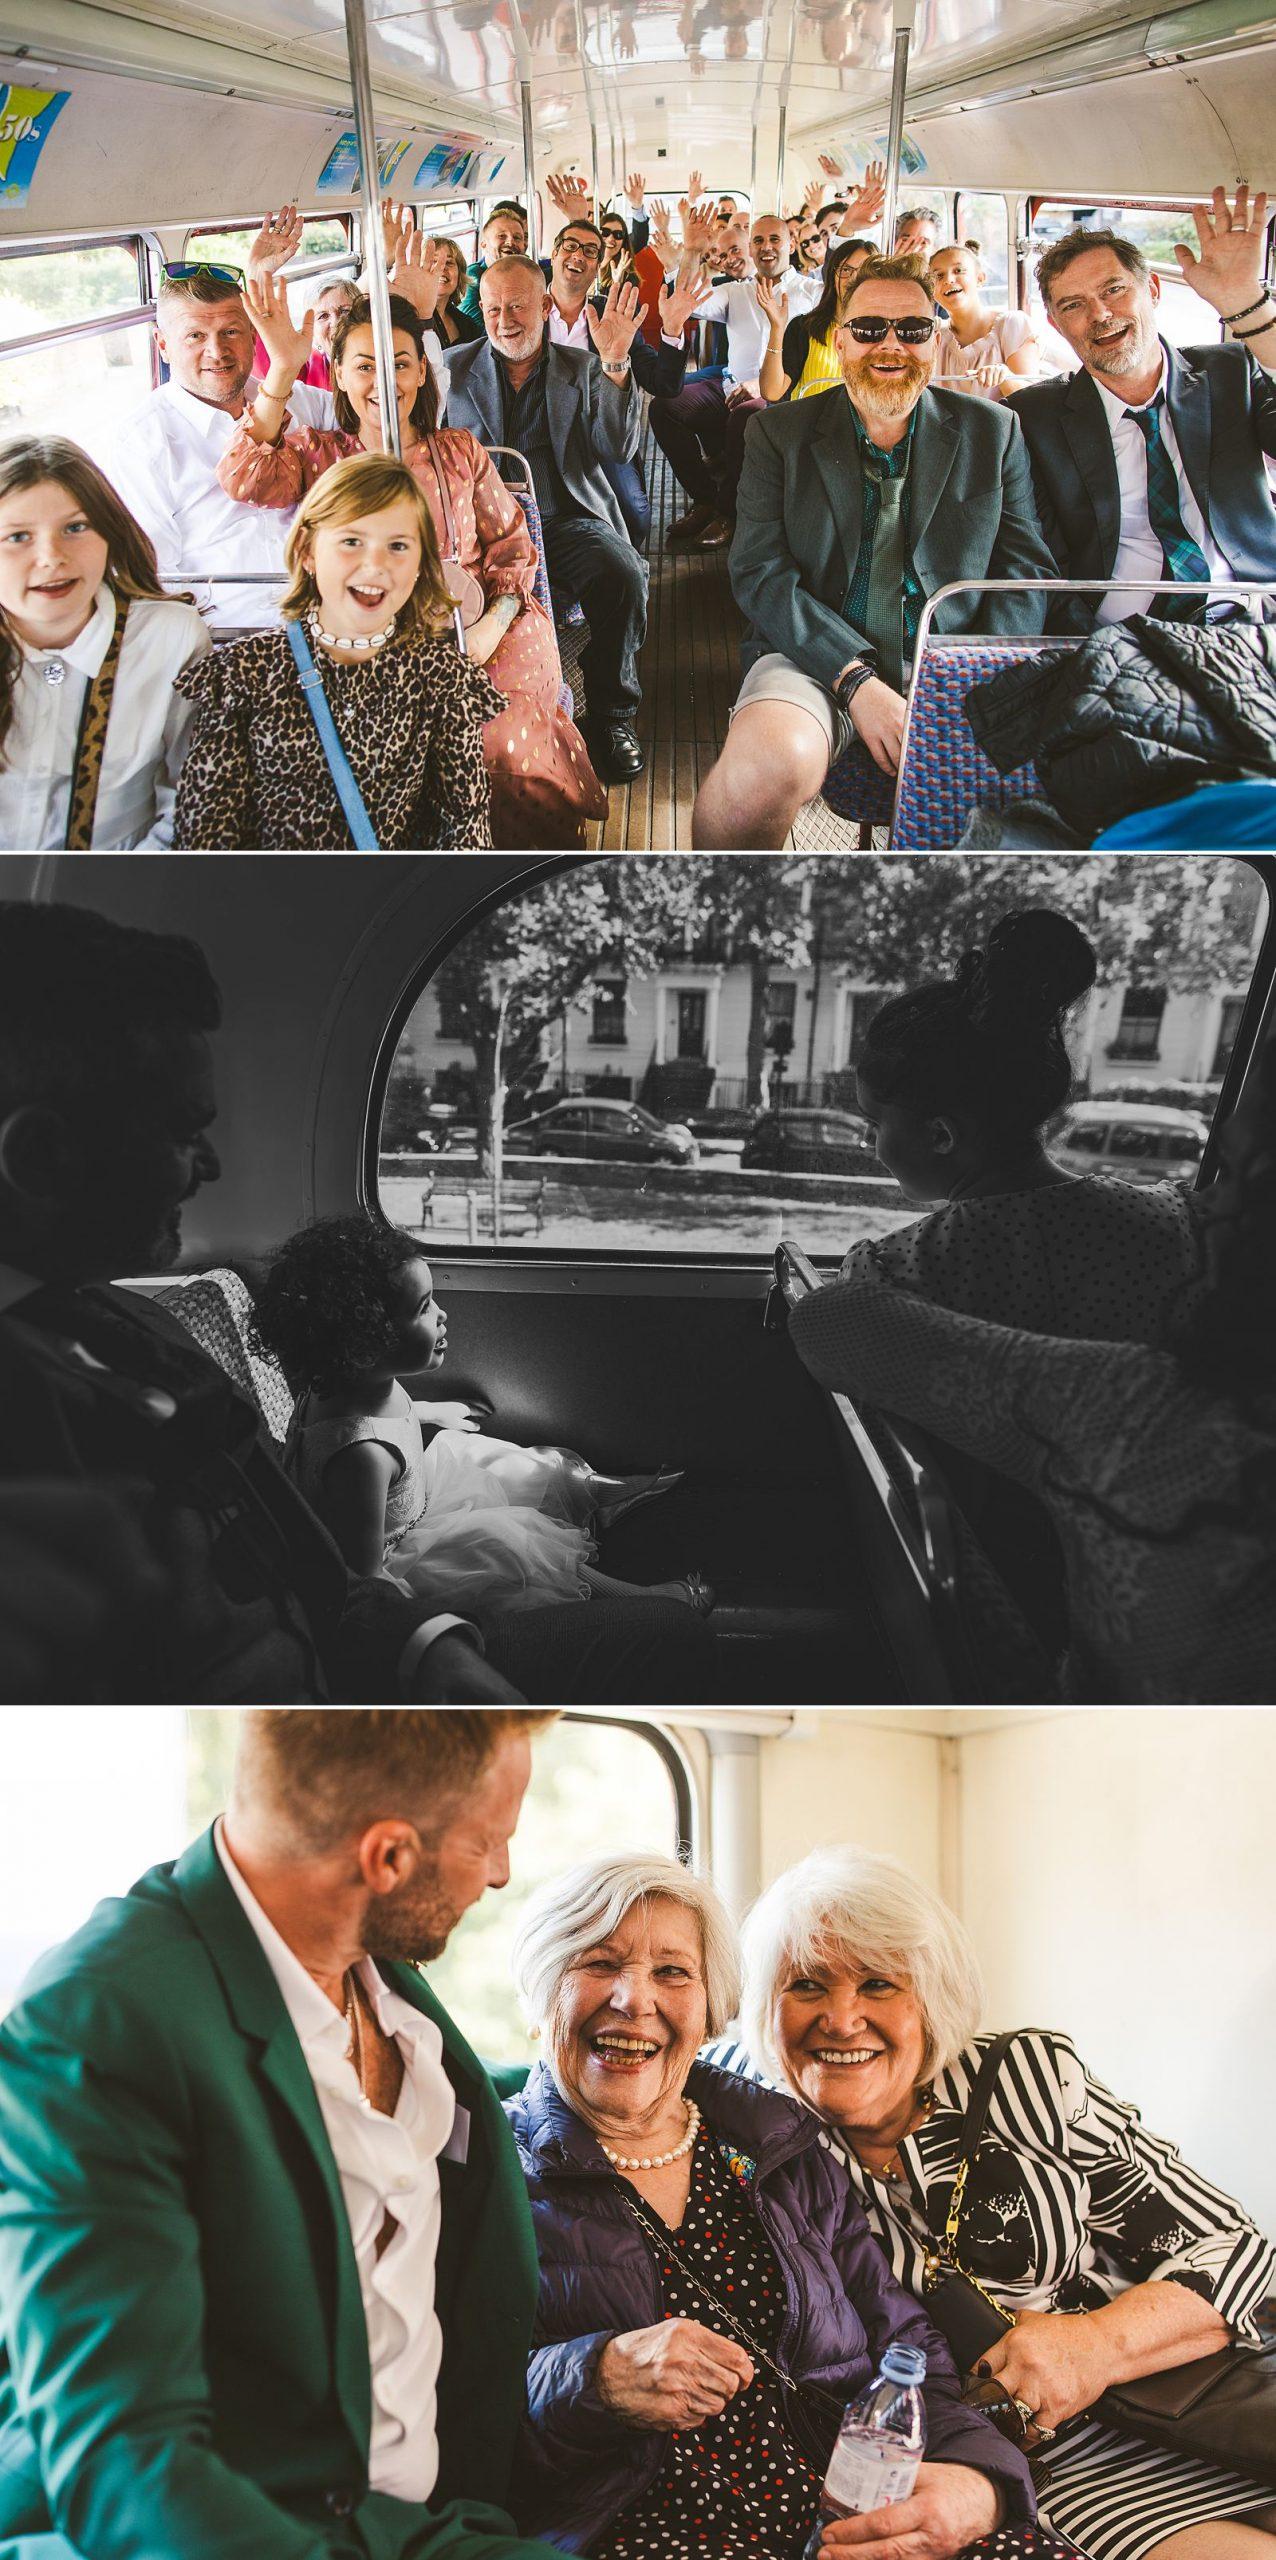 London bus gay wedding photography